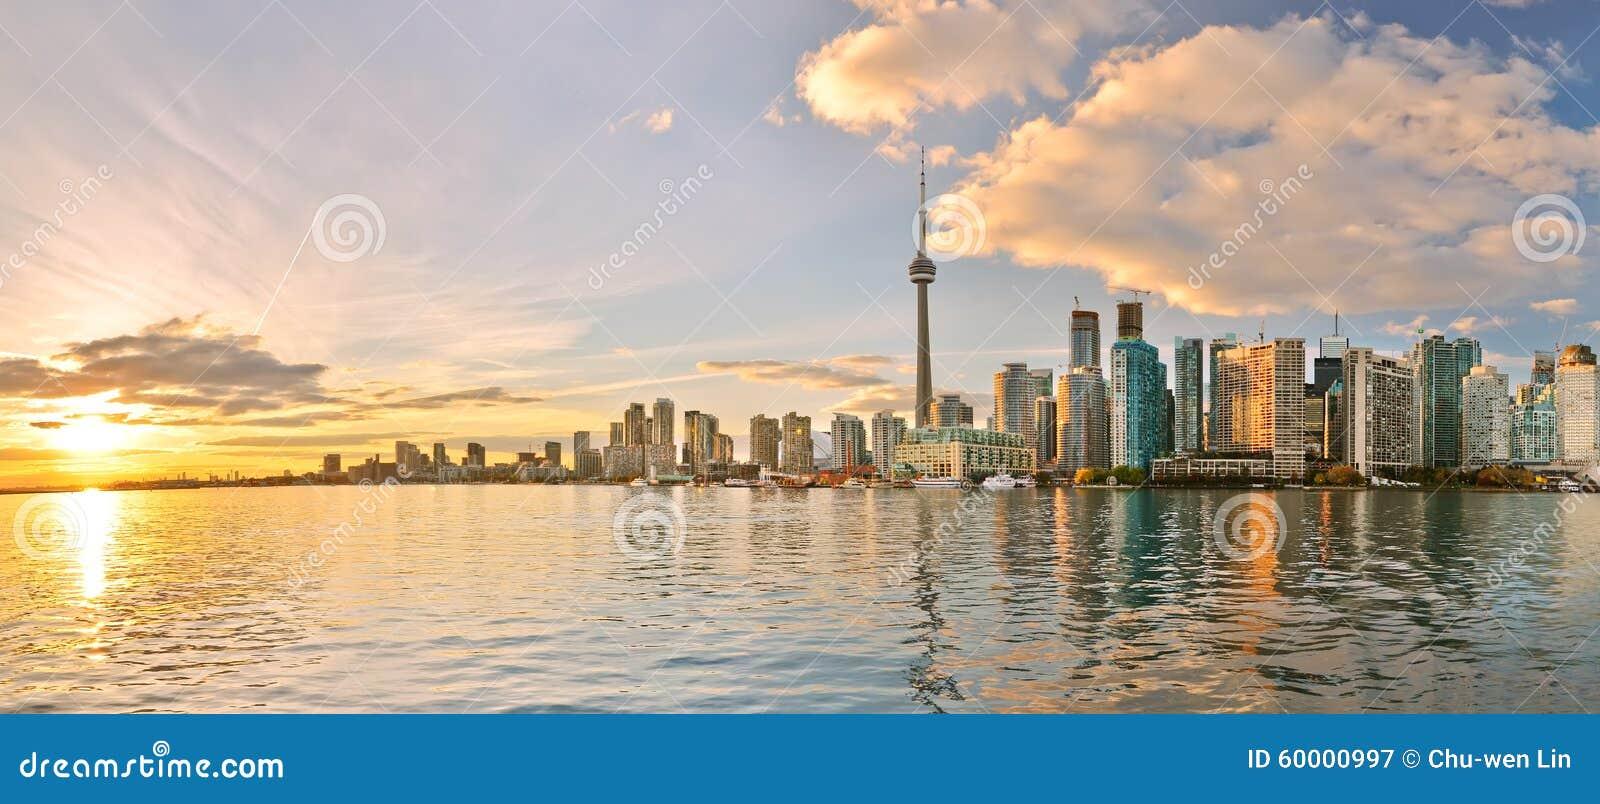 Toronto skyline at sunset in Ontario, Canada.